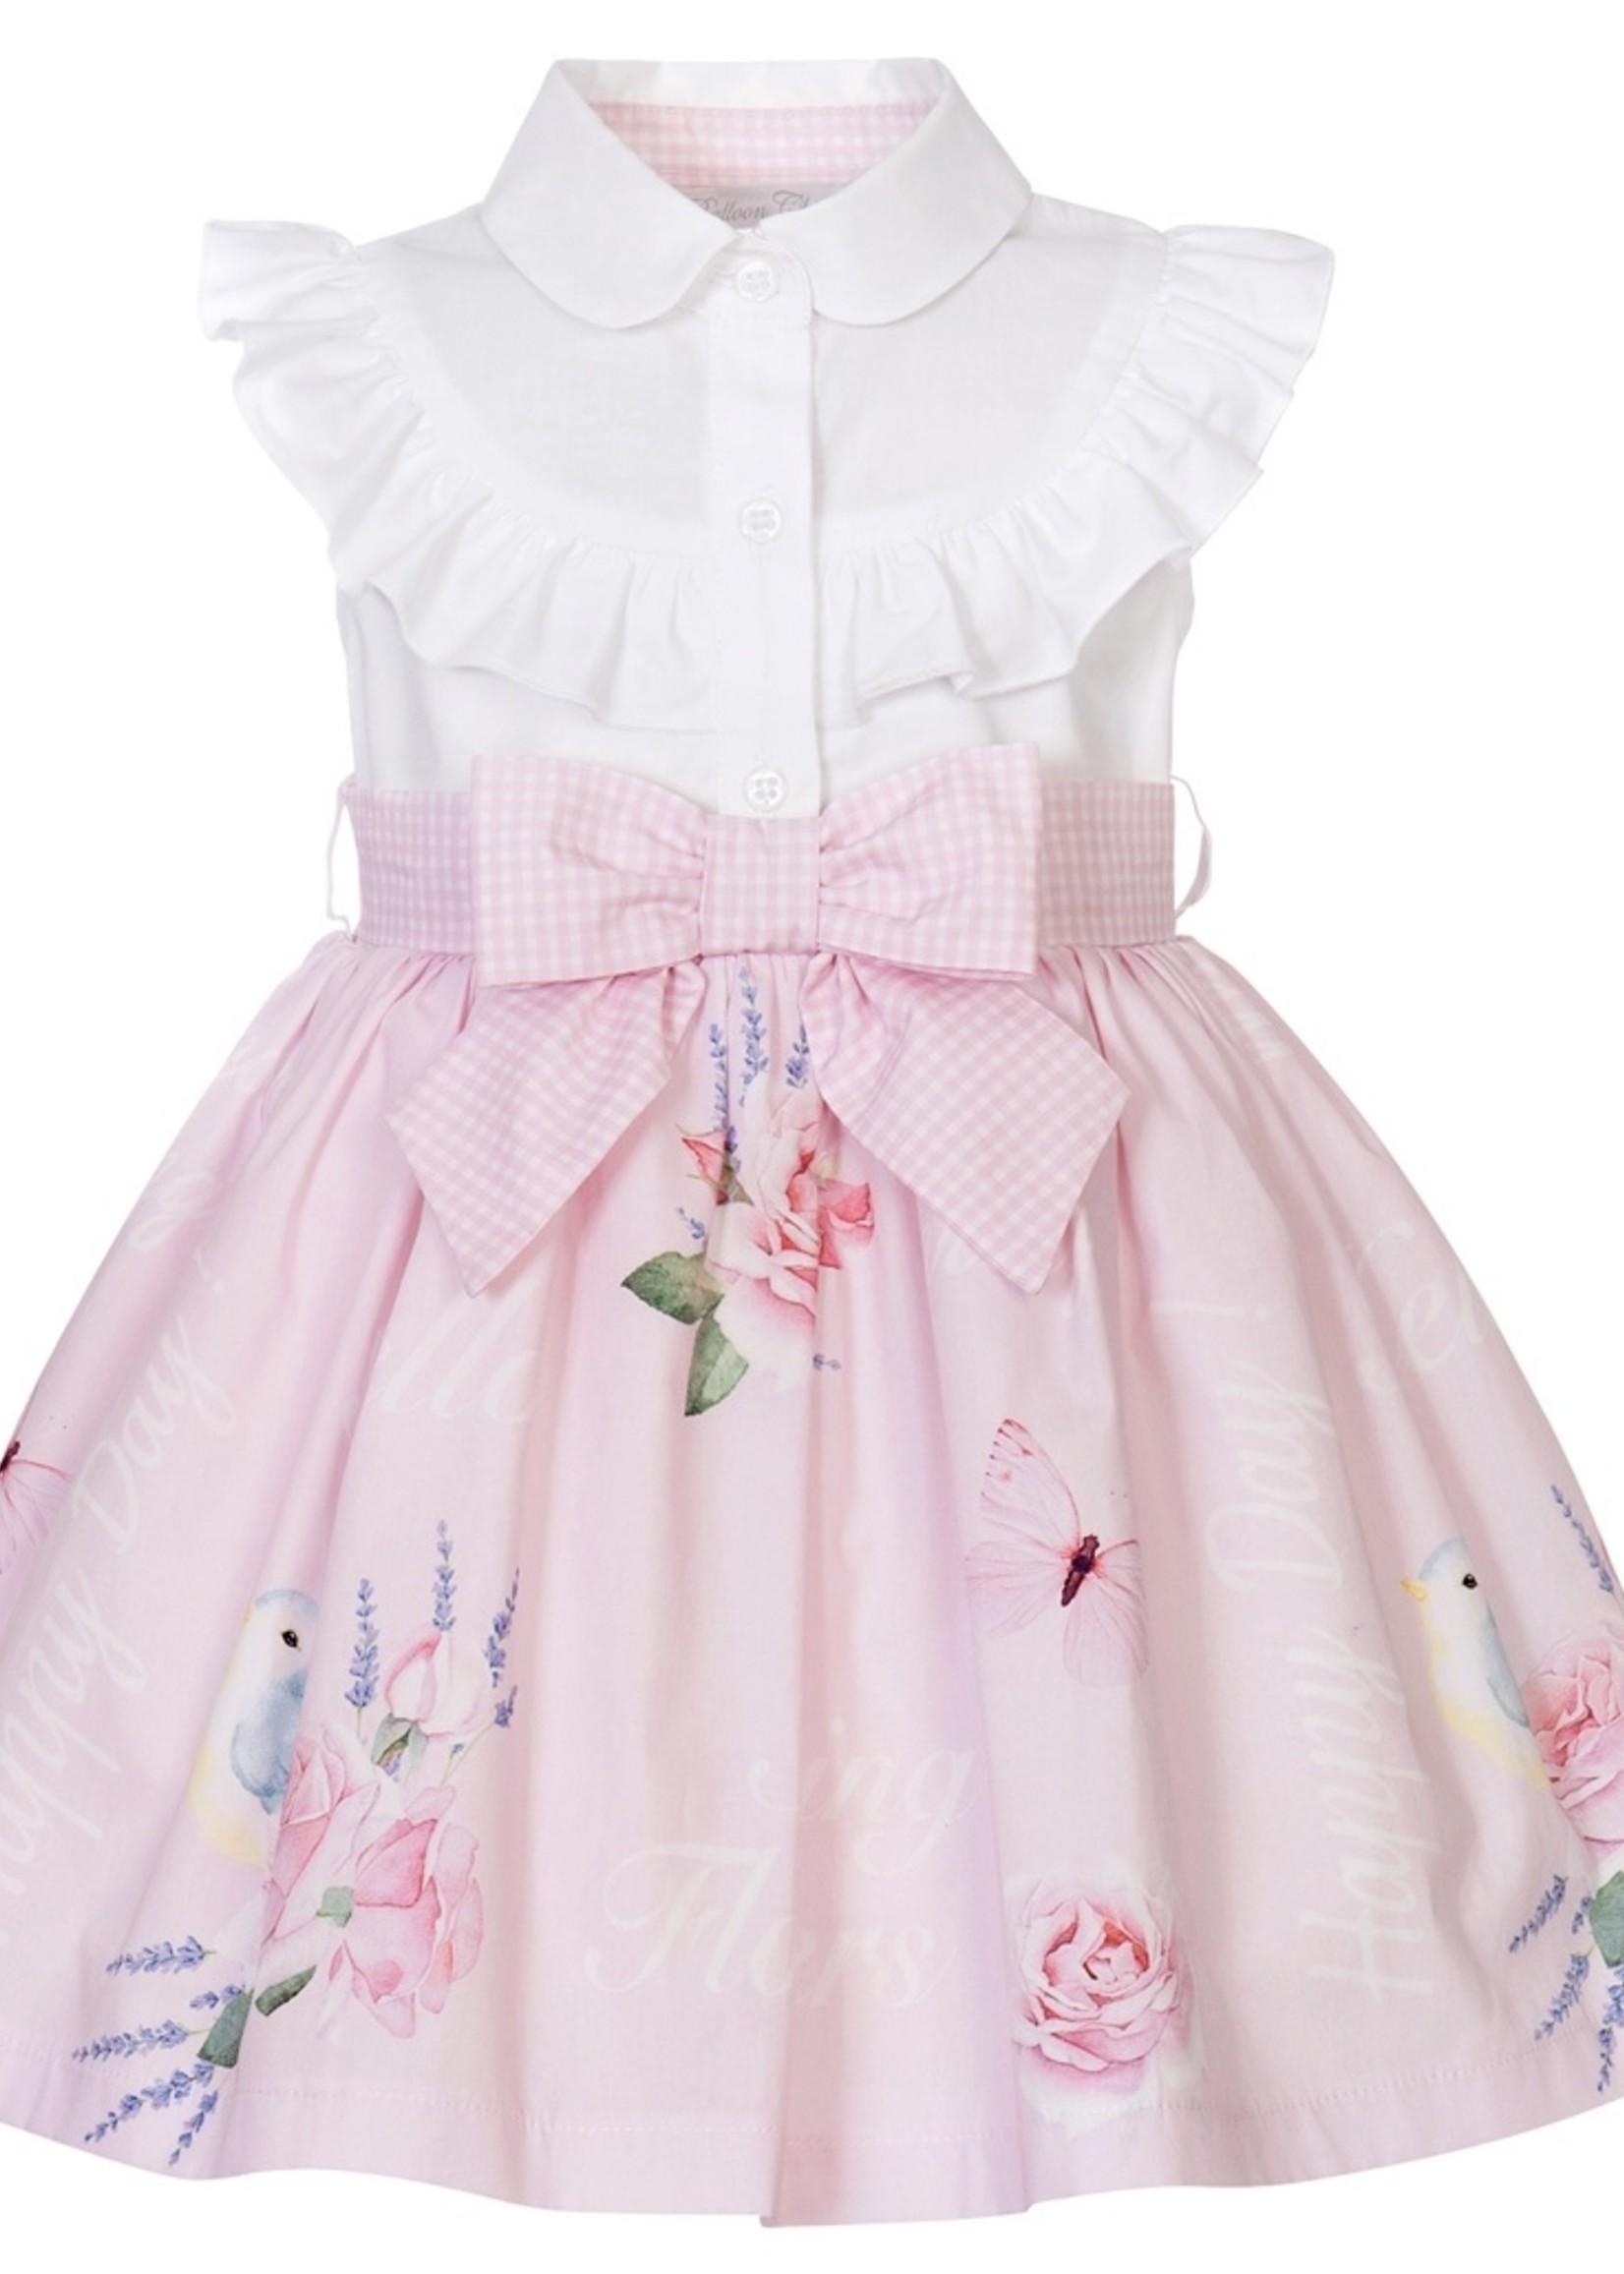 Balloon Chic Balloon Chic dress bow pink 235